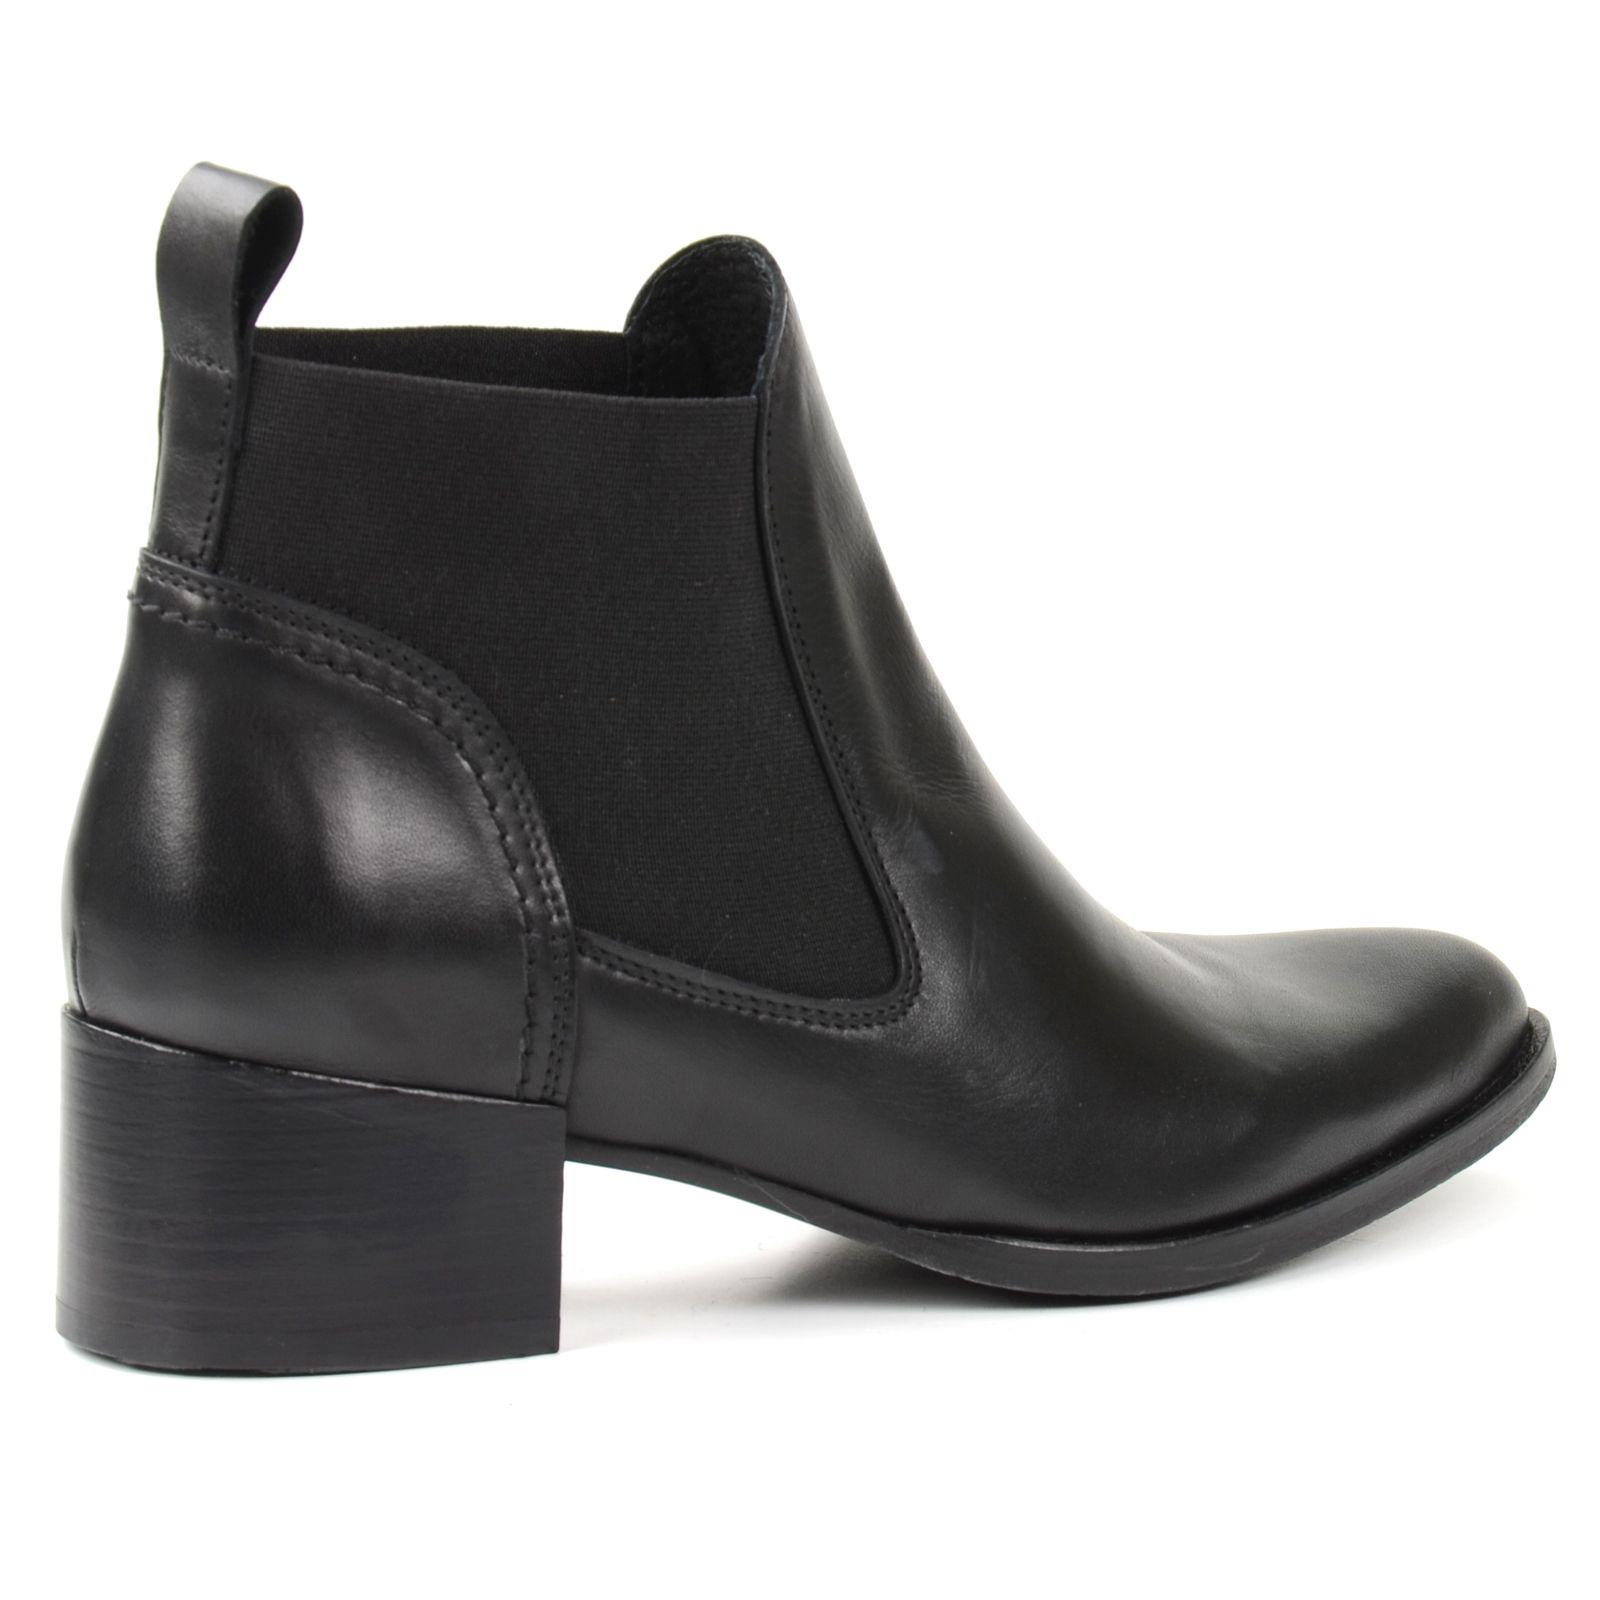 spitze chelsea boots schwarz damenschuhe. Black Bedroom Furniture Sets. Home Design Ideas